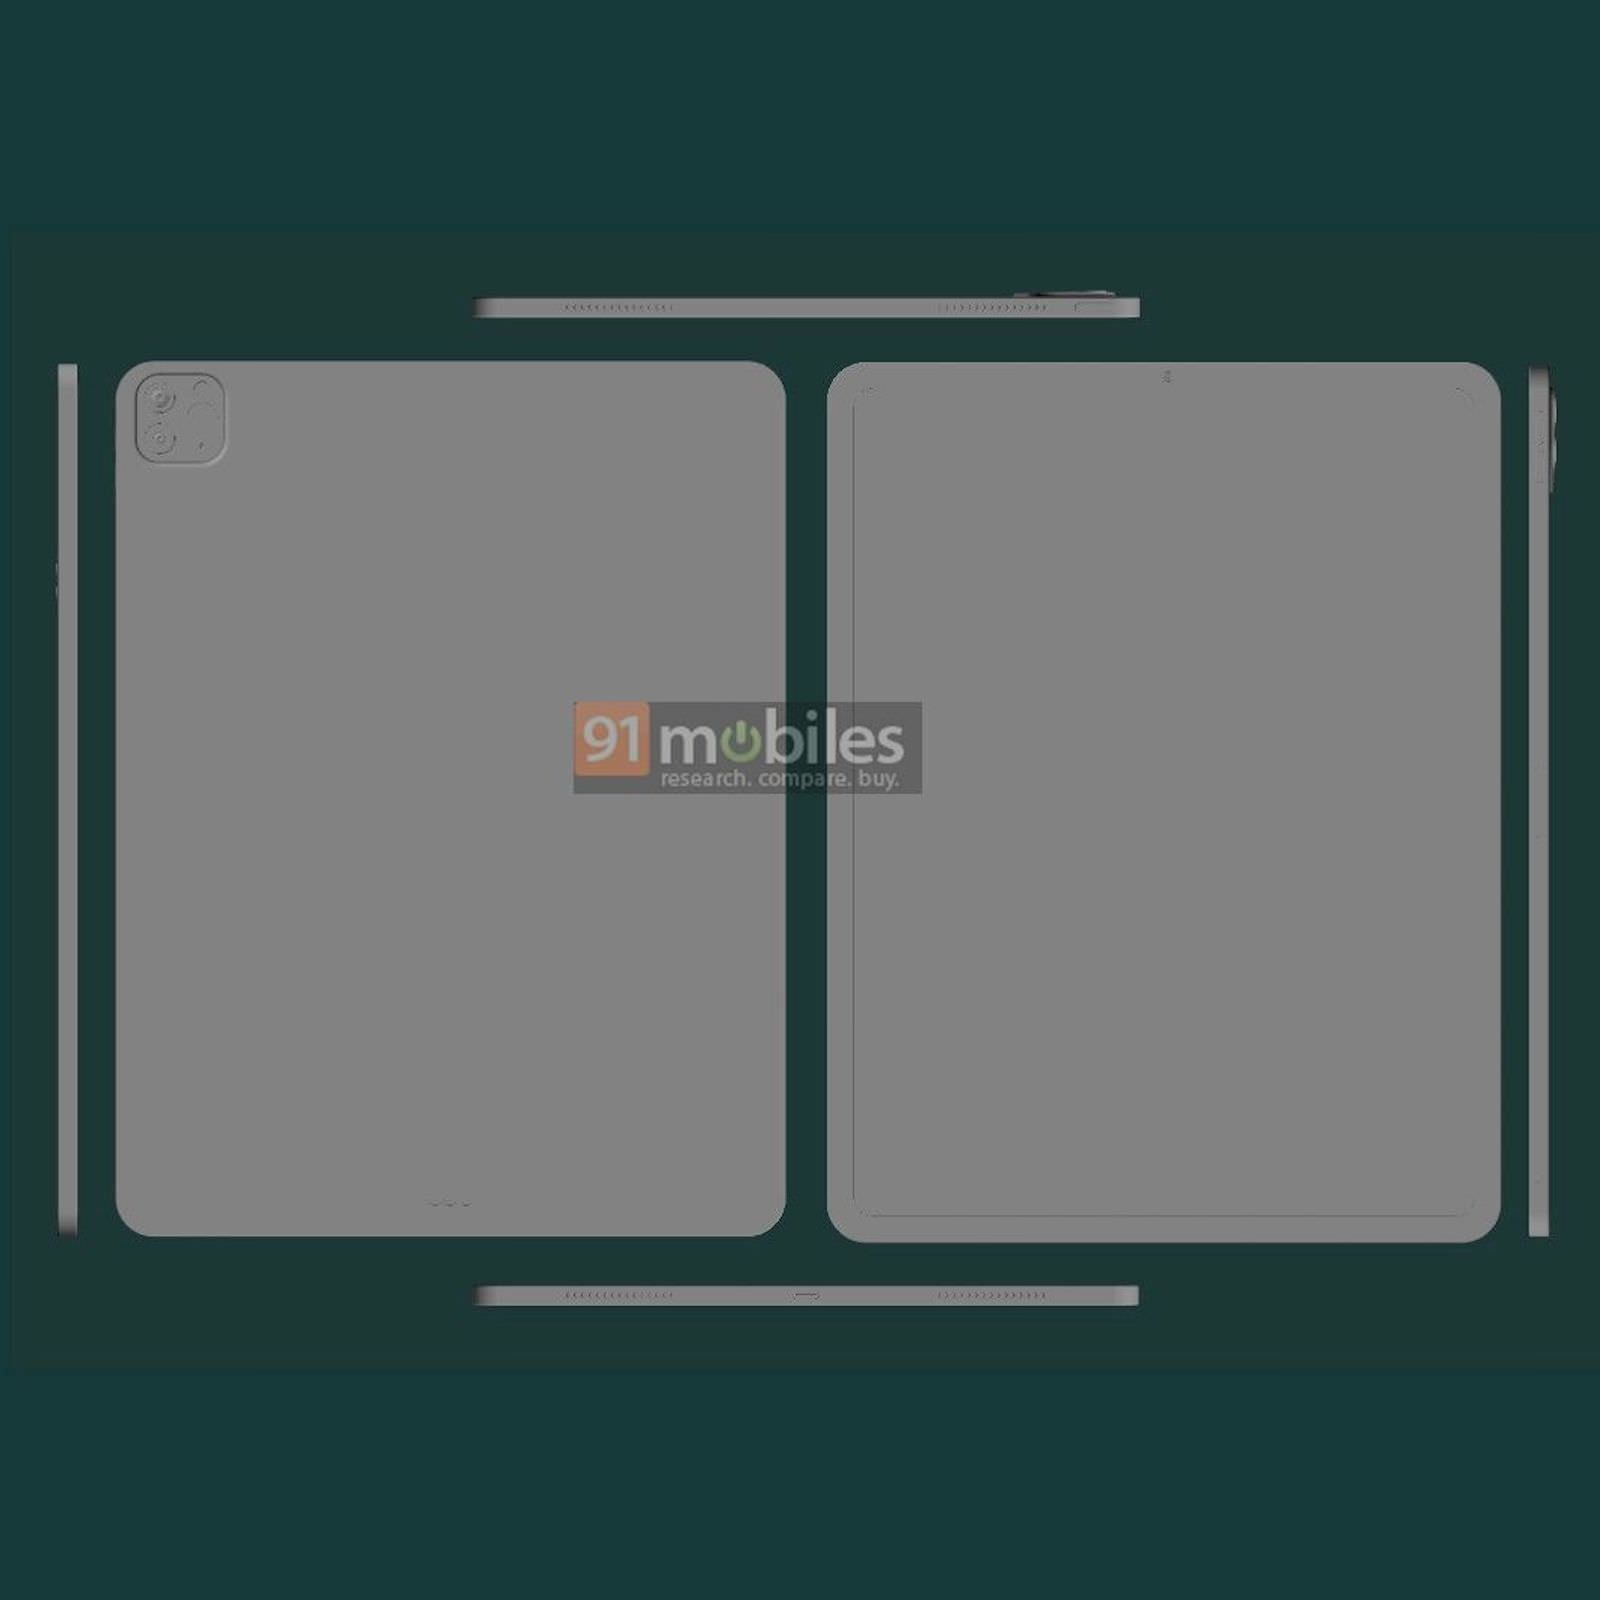 iPad-Pro-2021-Cad-renders-08.jpg